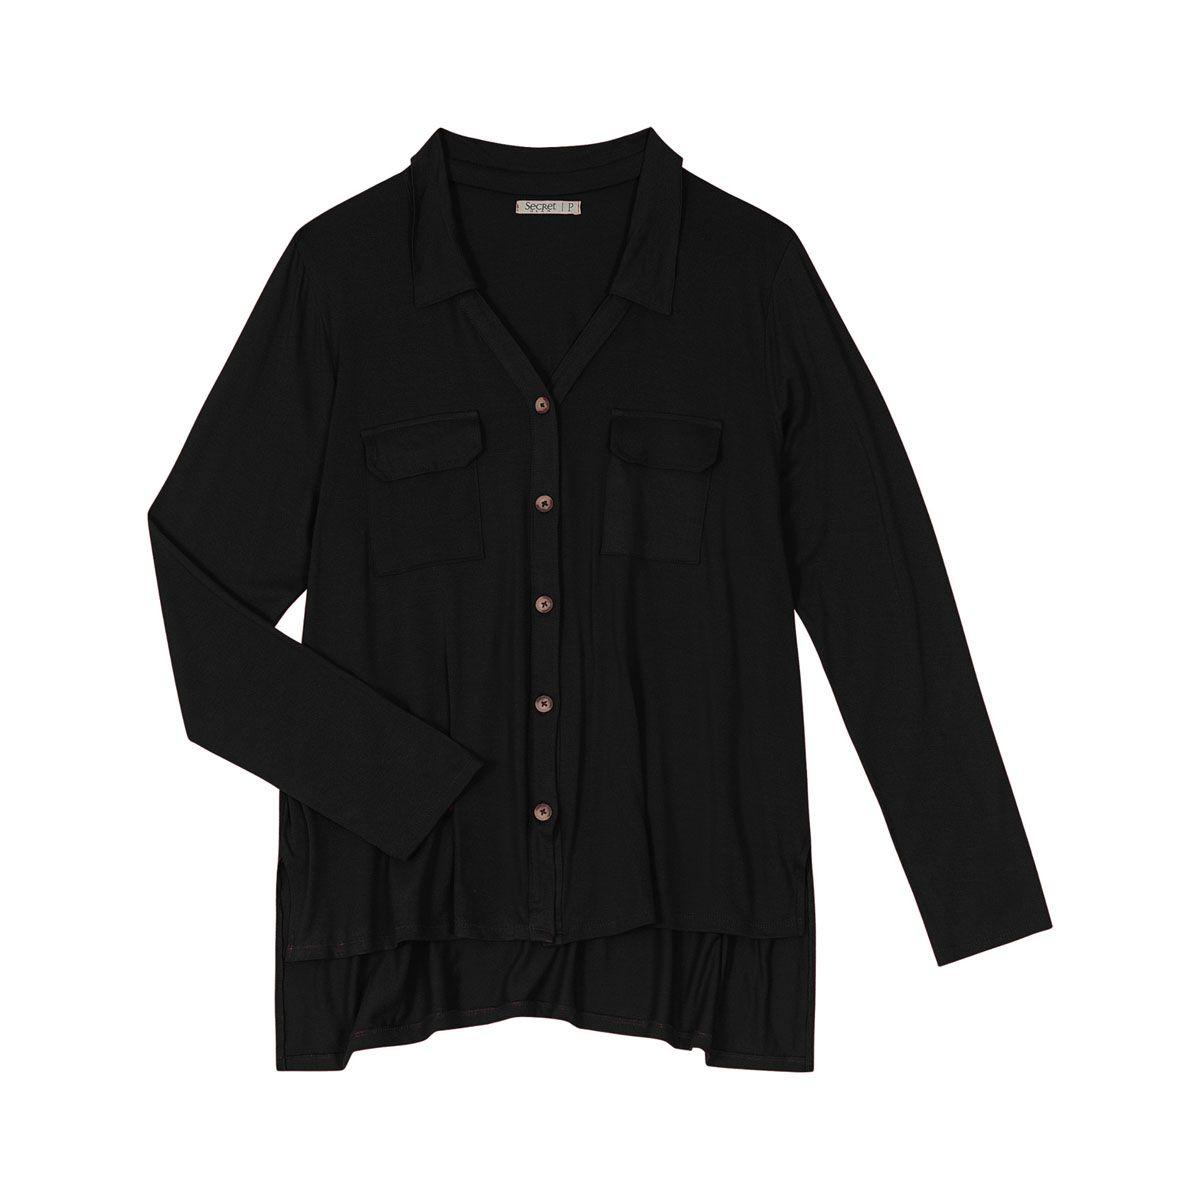 Camisa manga longa Feminina Secret S00692